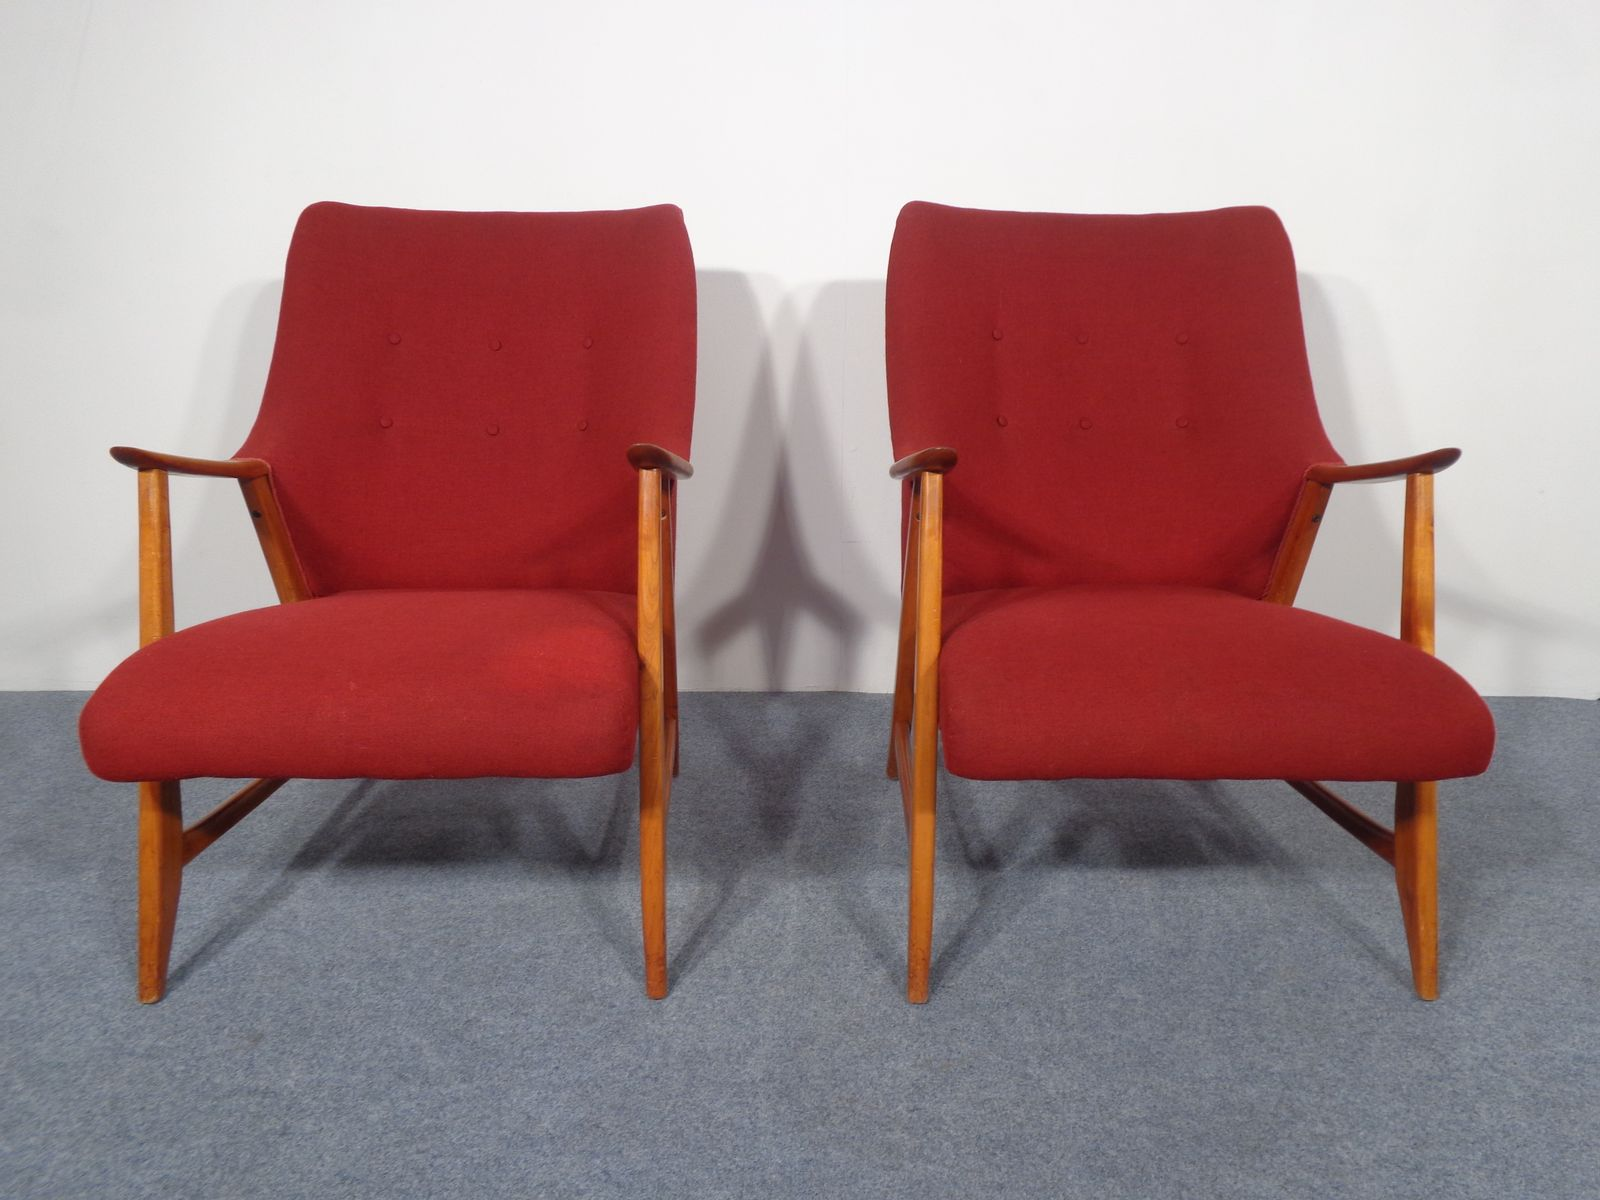 vintage sessel aus kirschholz in rot bei pamono kaufen. Black Bedroom Furniture Sets. Home Design Ideas